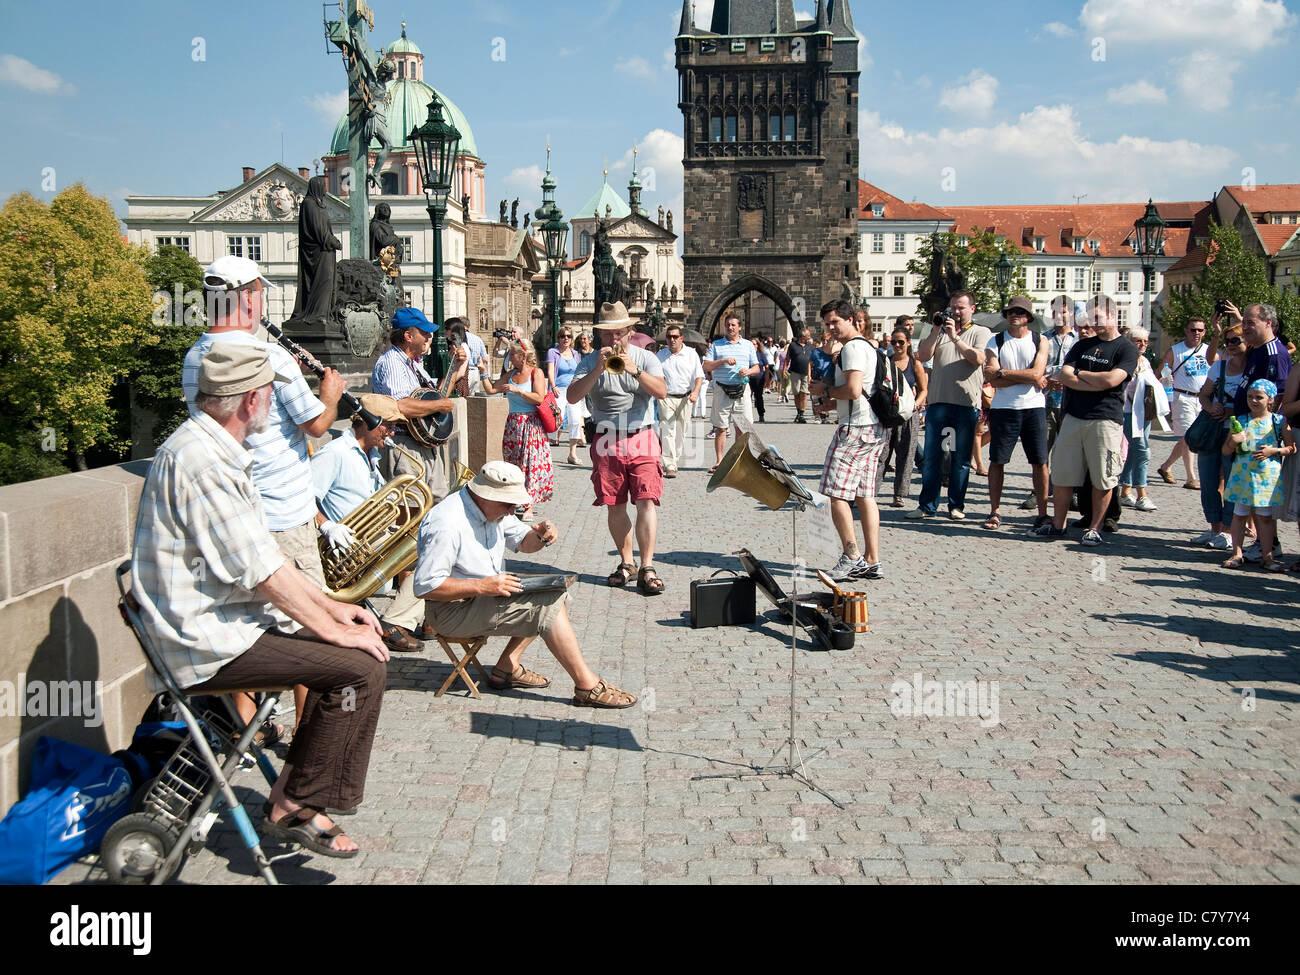 Prague, Czech Republic - Jazz band playing music on Bridge Charles - Stock Image